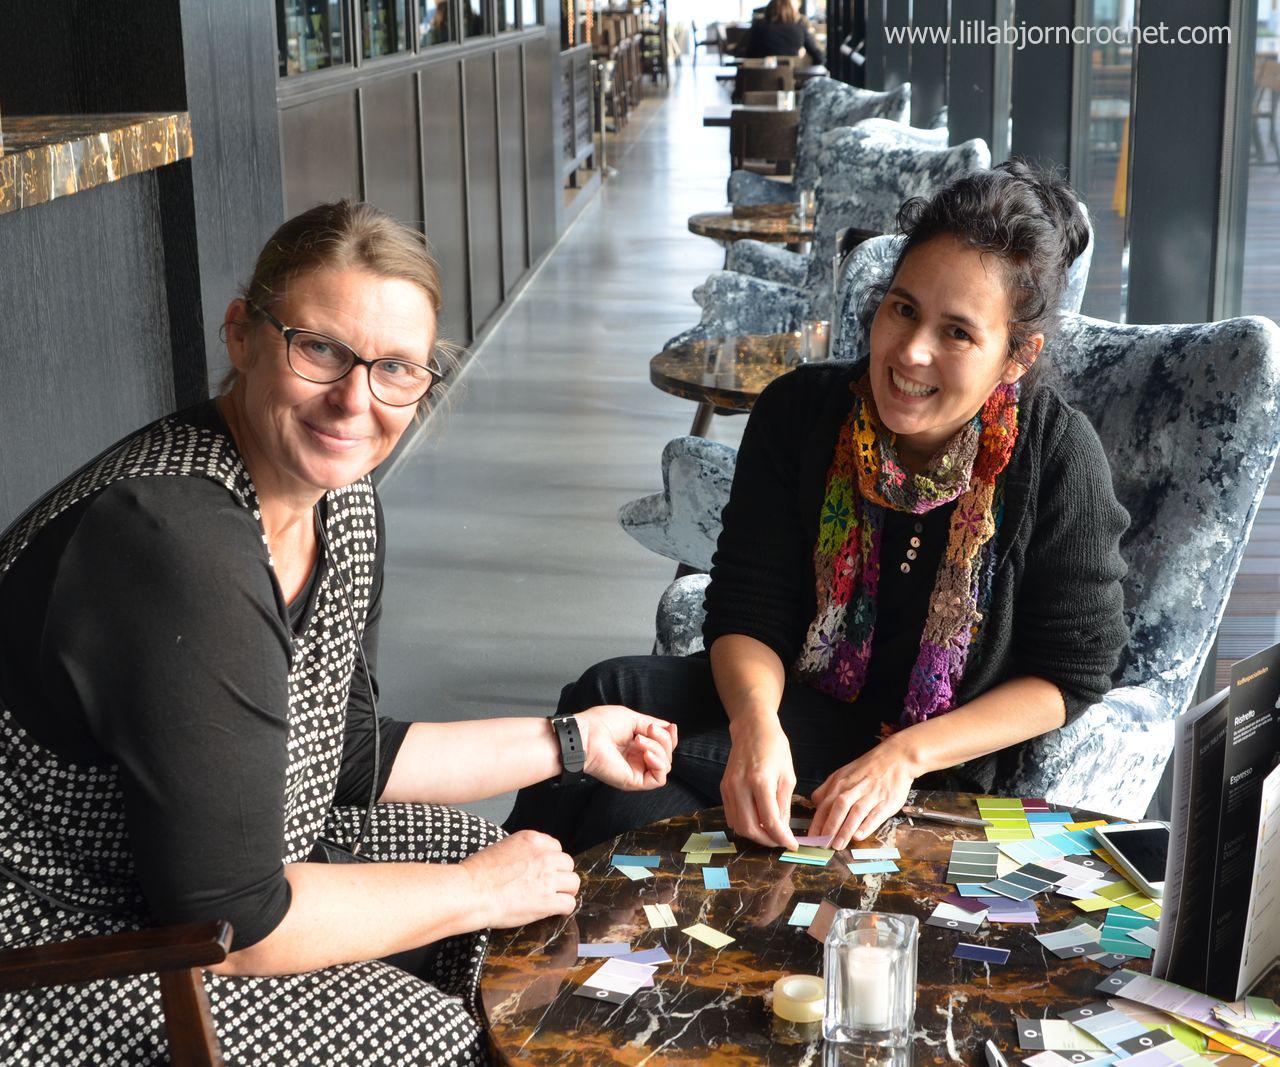 Scheepjes Bloggers Days 2016: Jellina Creations and Atty's